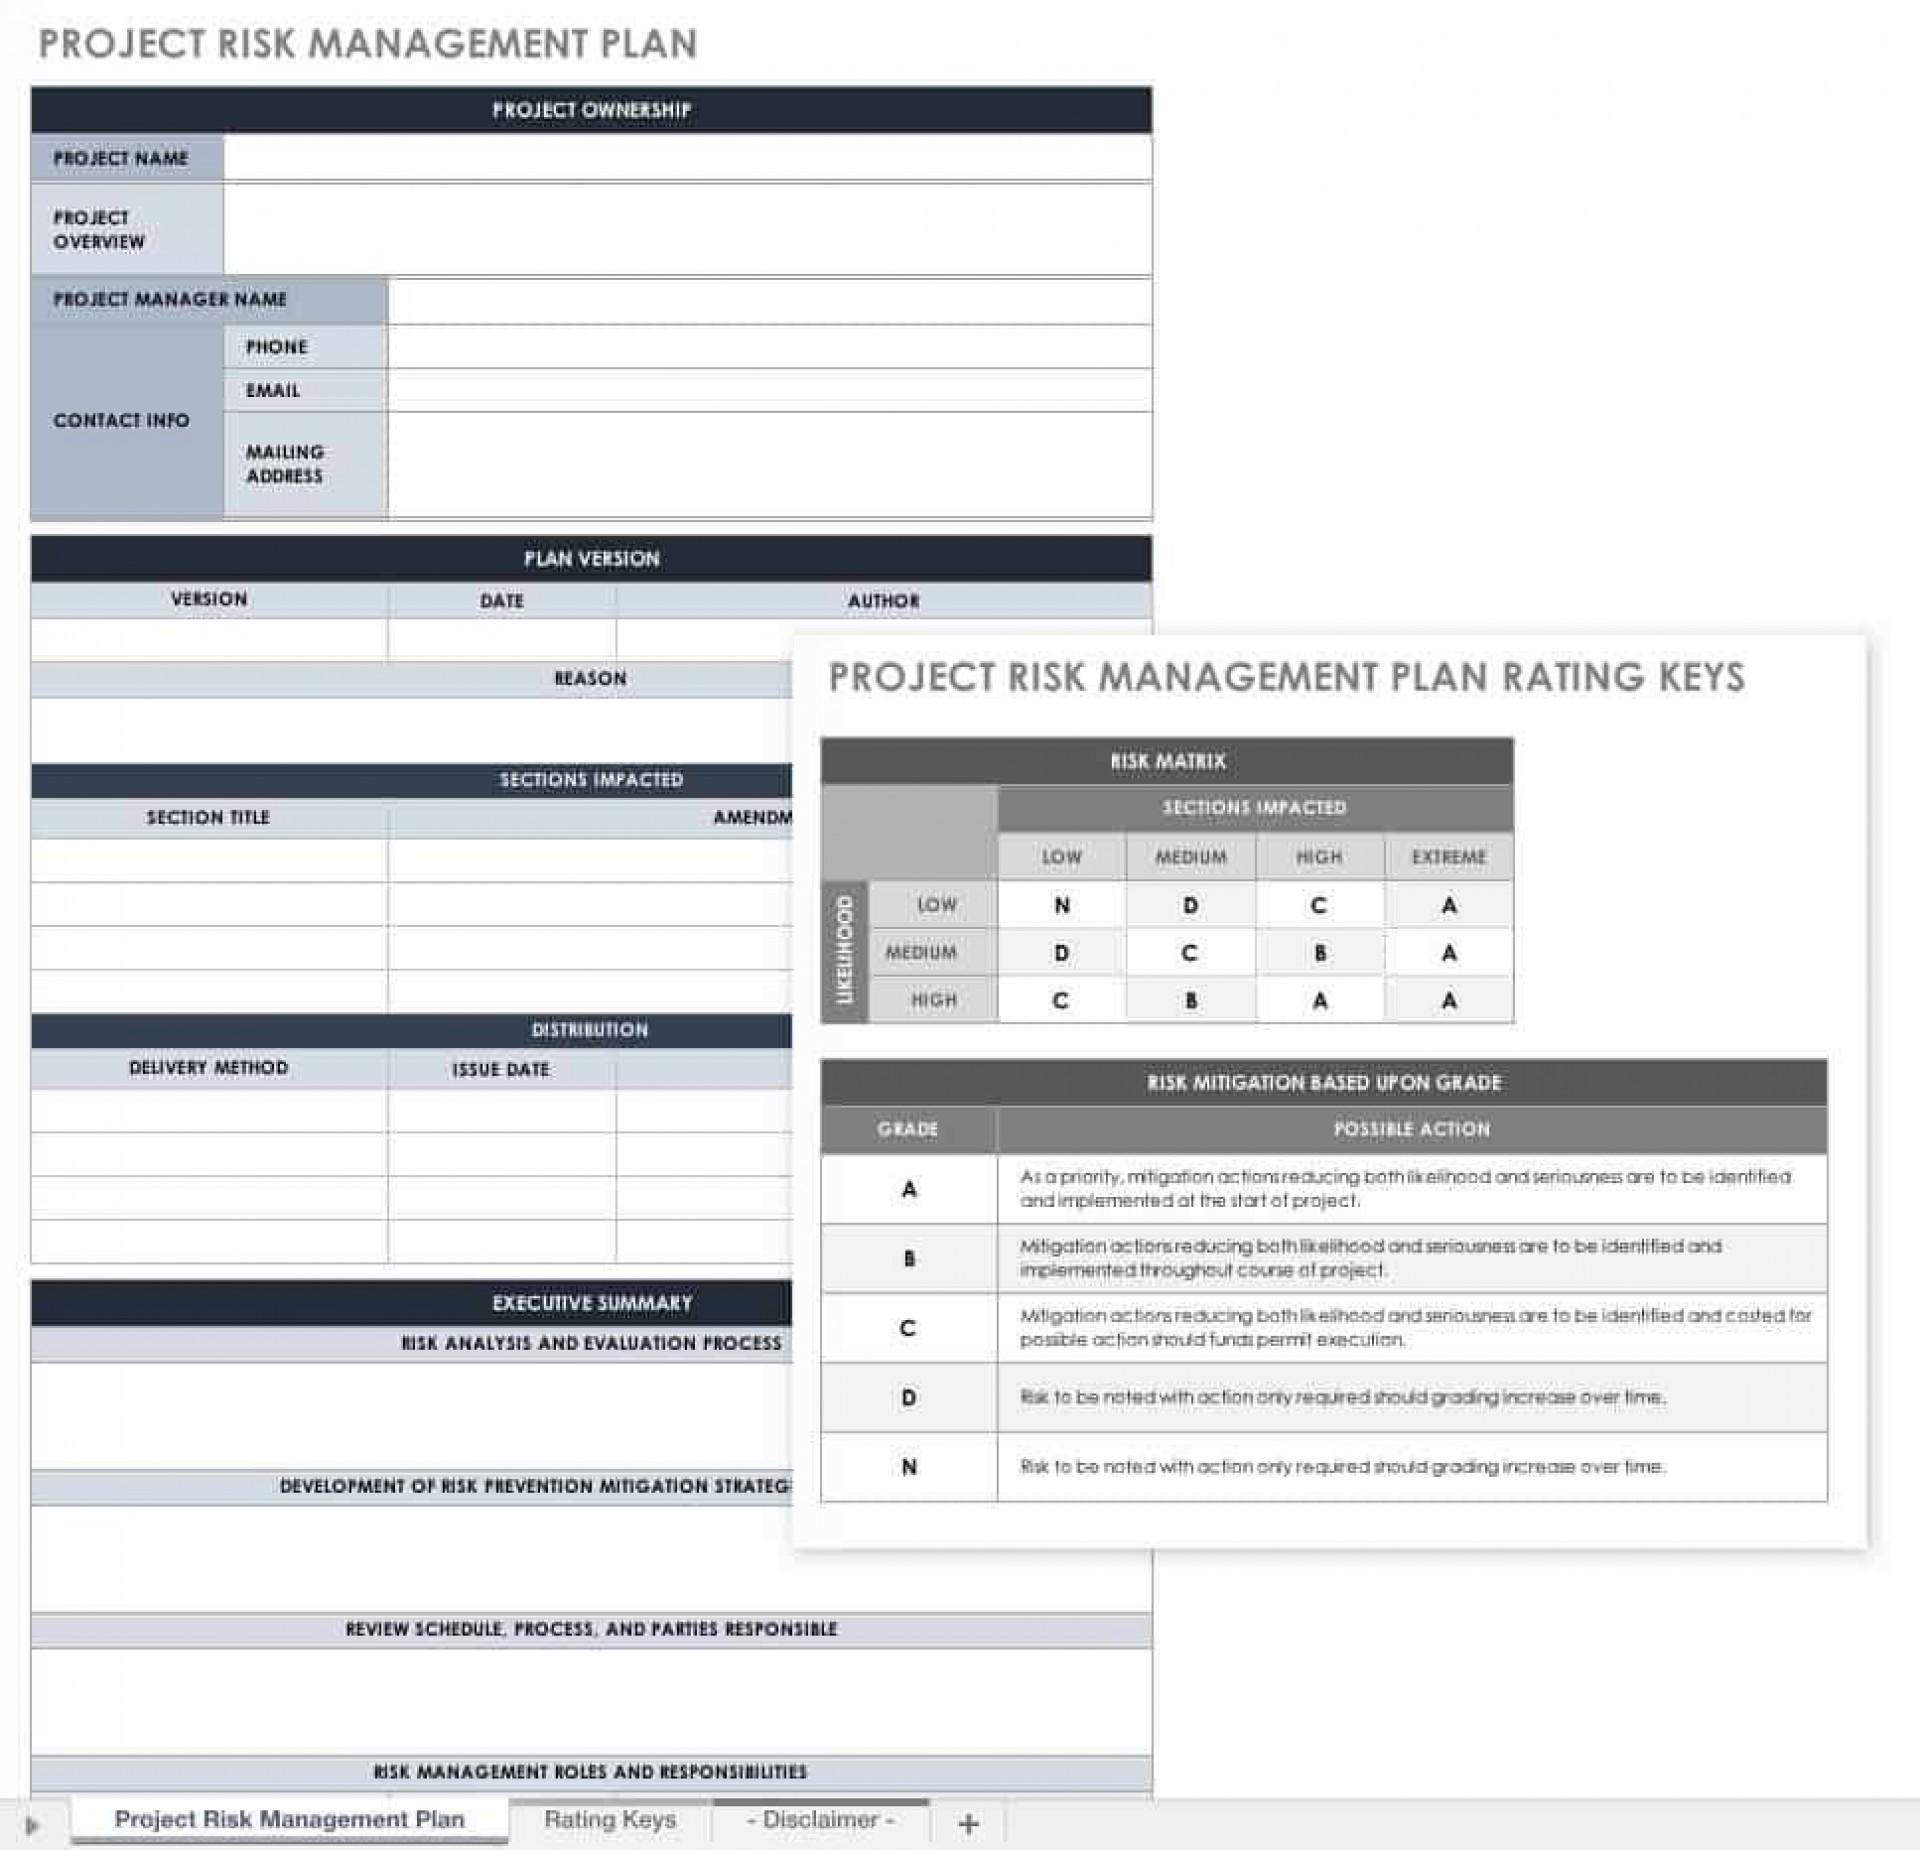 004 Shocking Simple Project Management Plan Template Excel Concept 1920